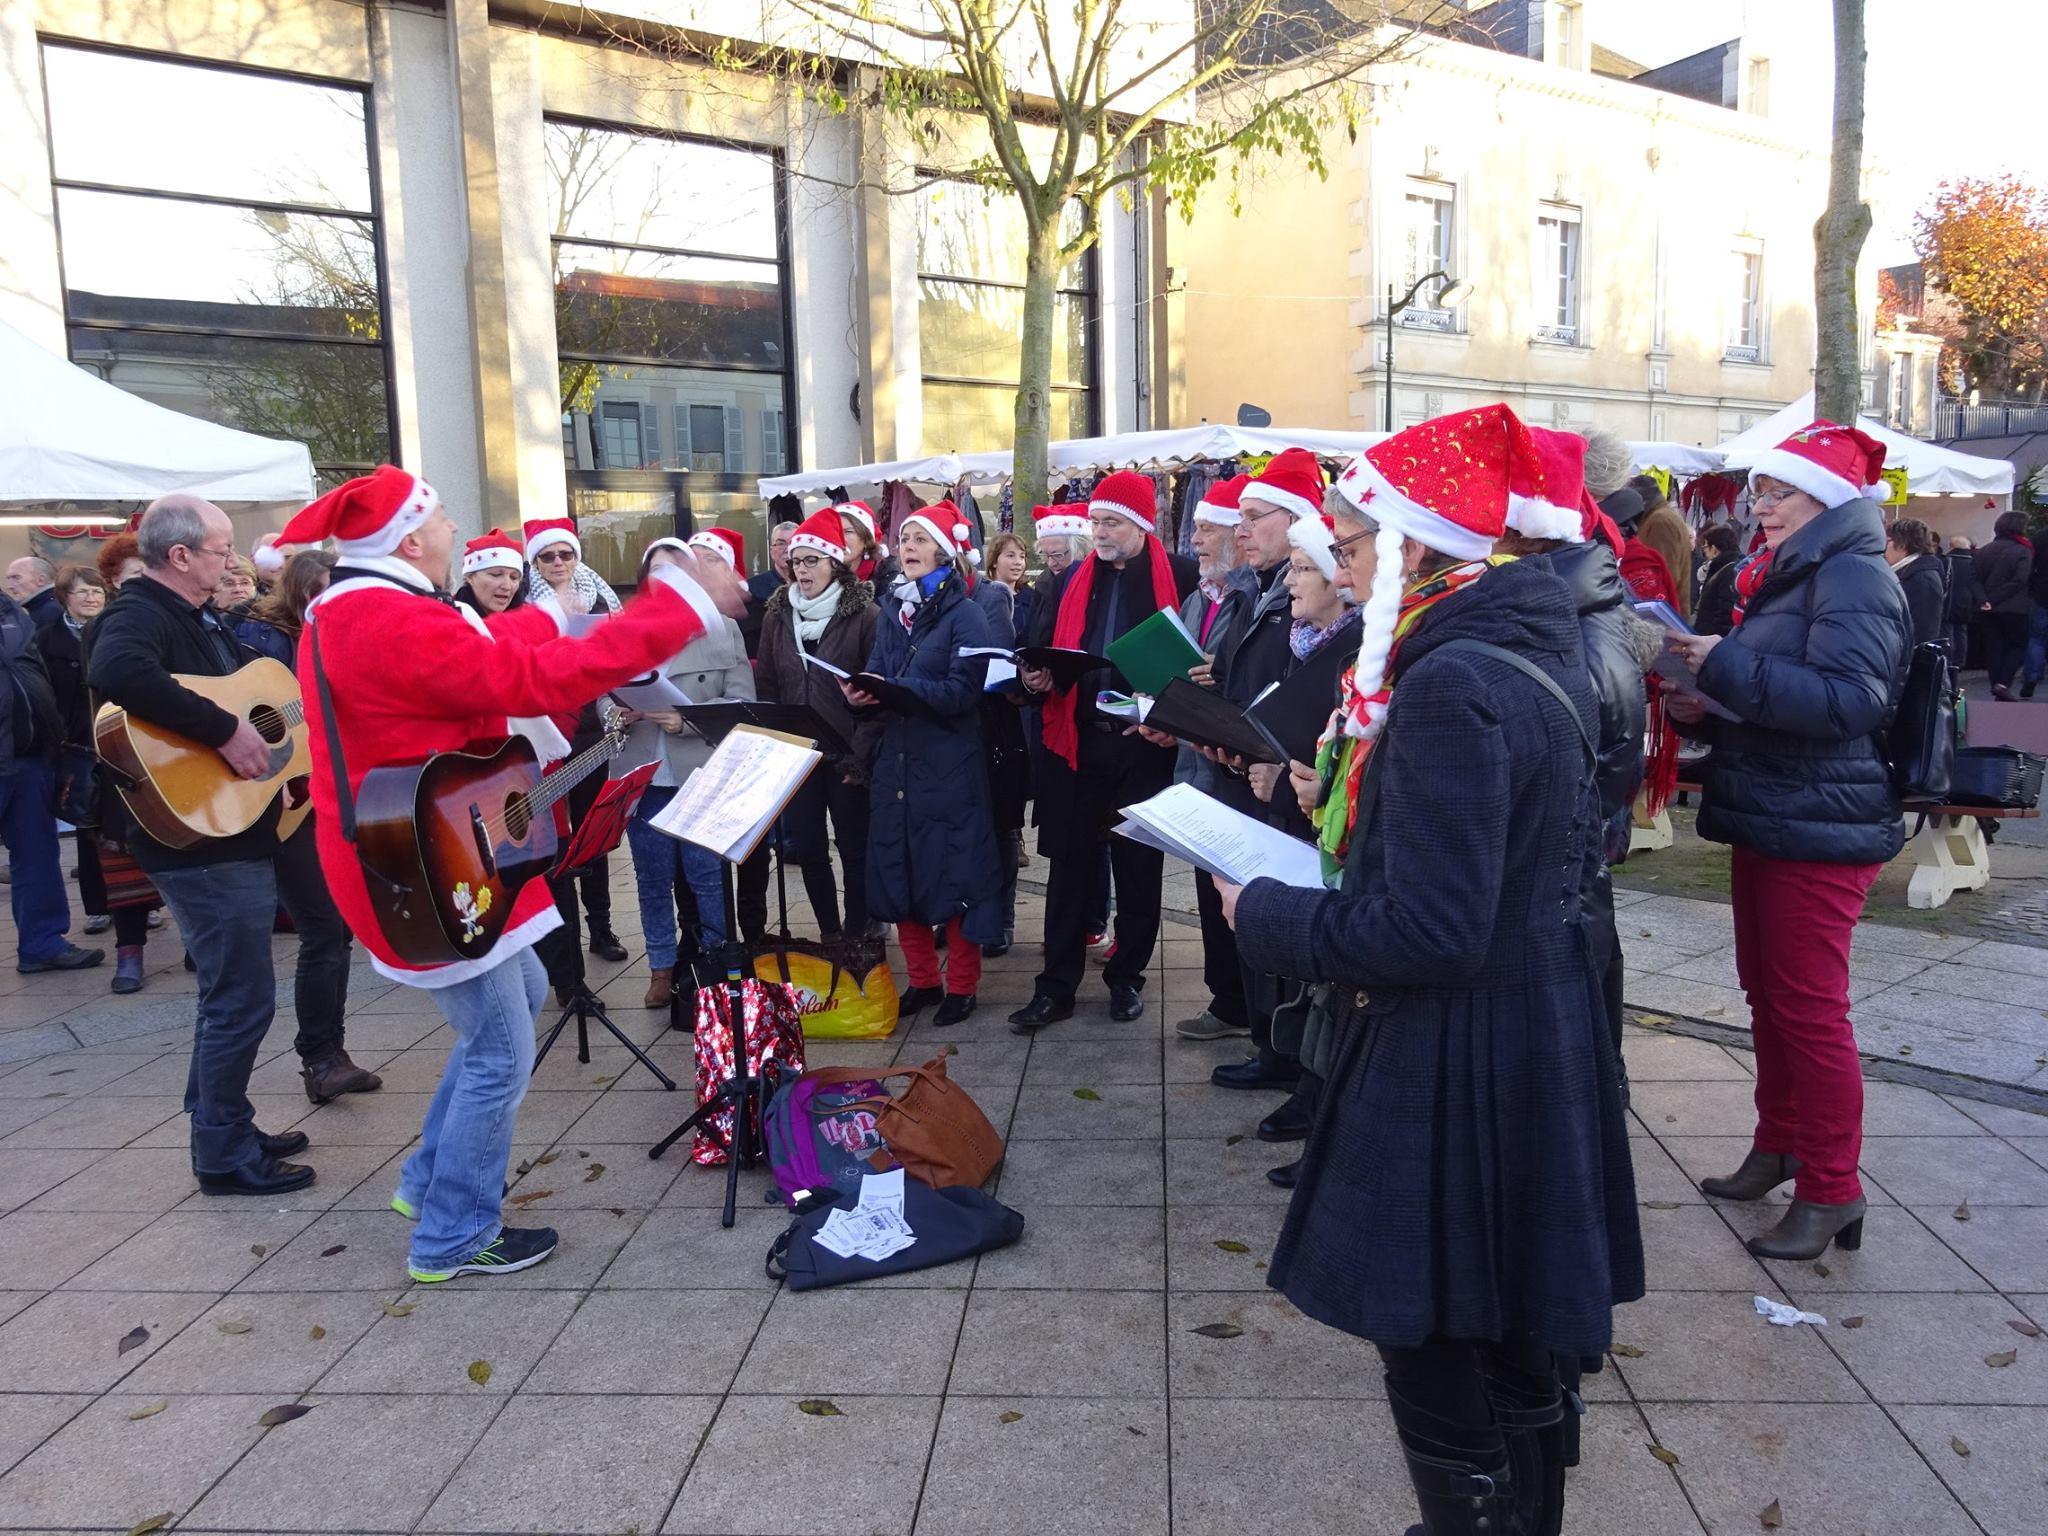 2015-12-12 – Au marché de Noël (3) Sabrina